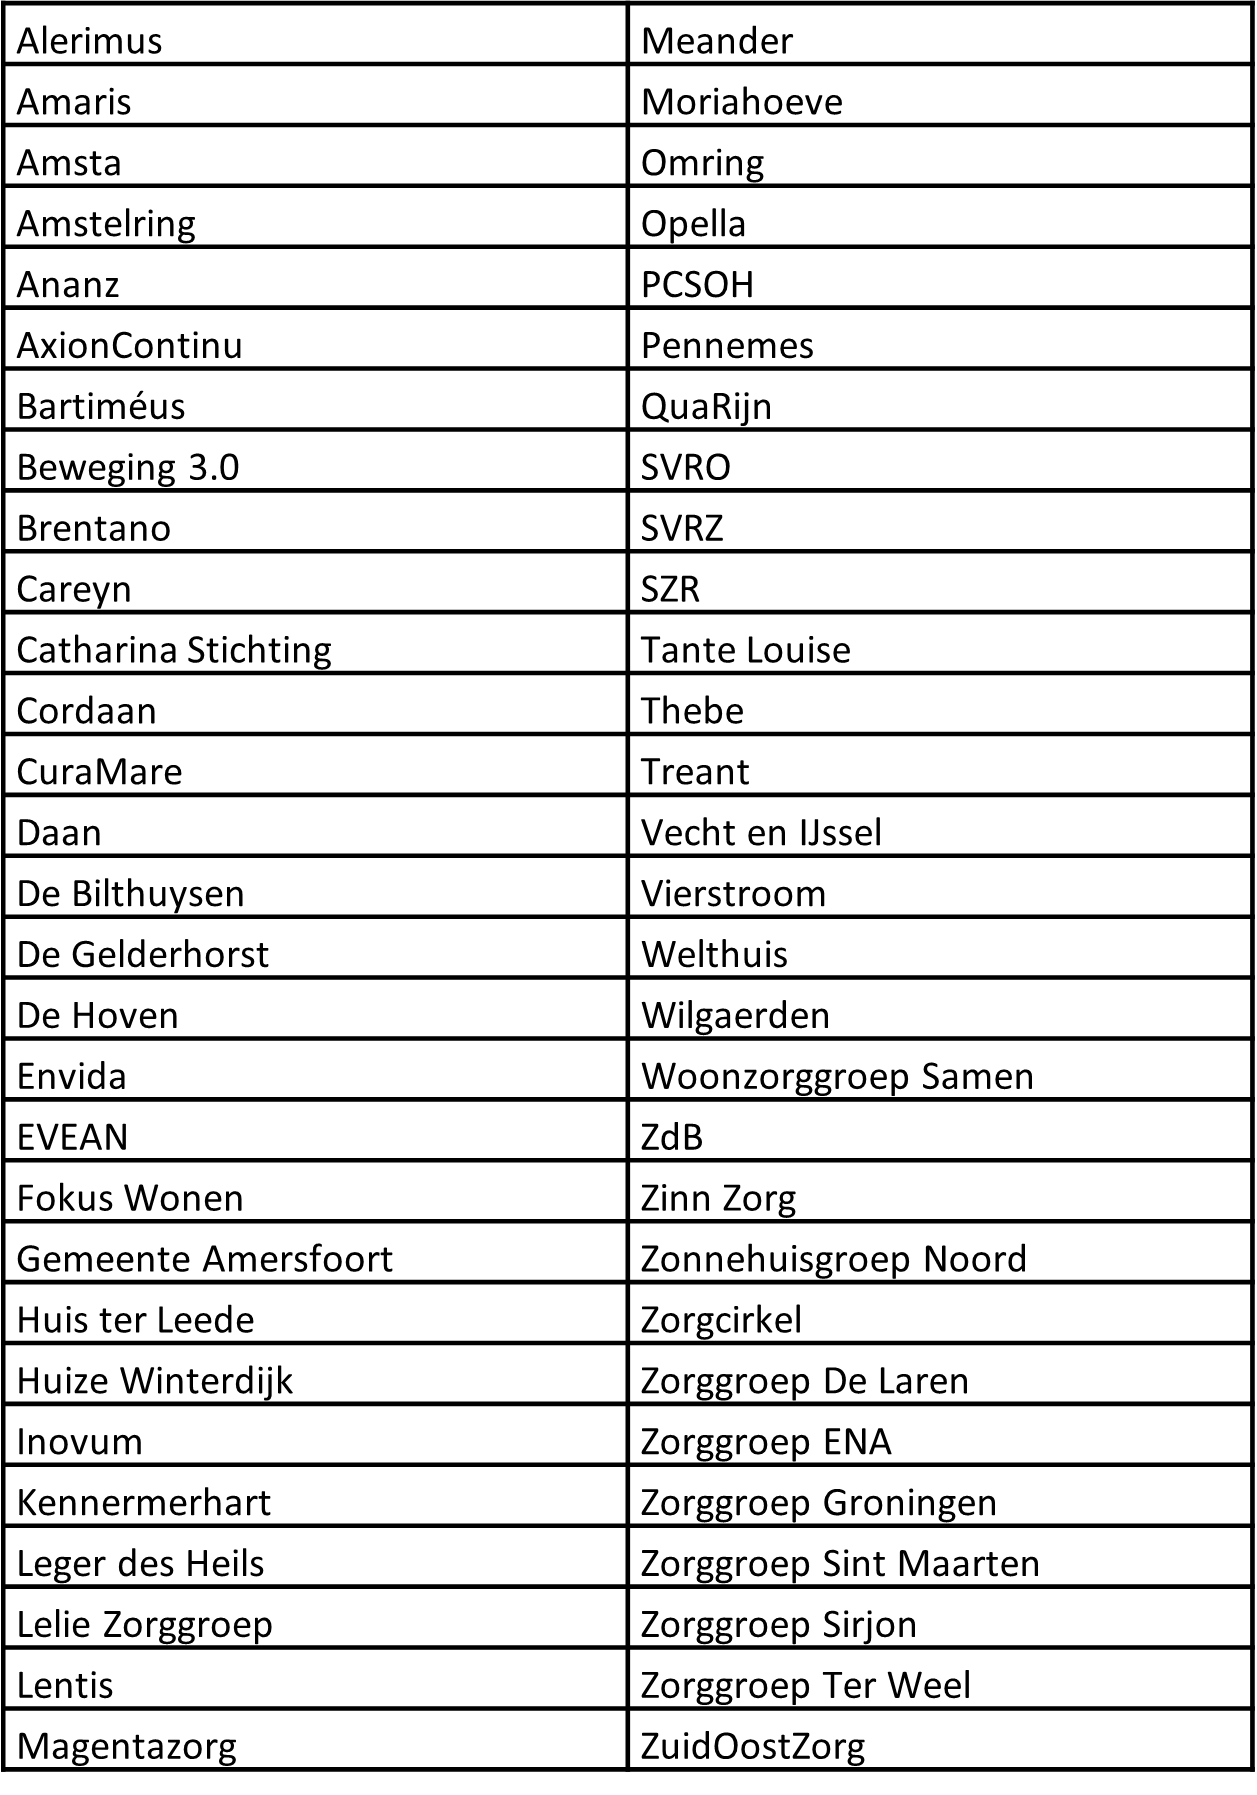   SVOZ